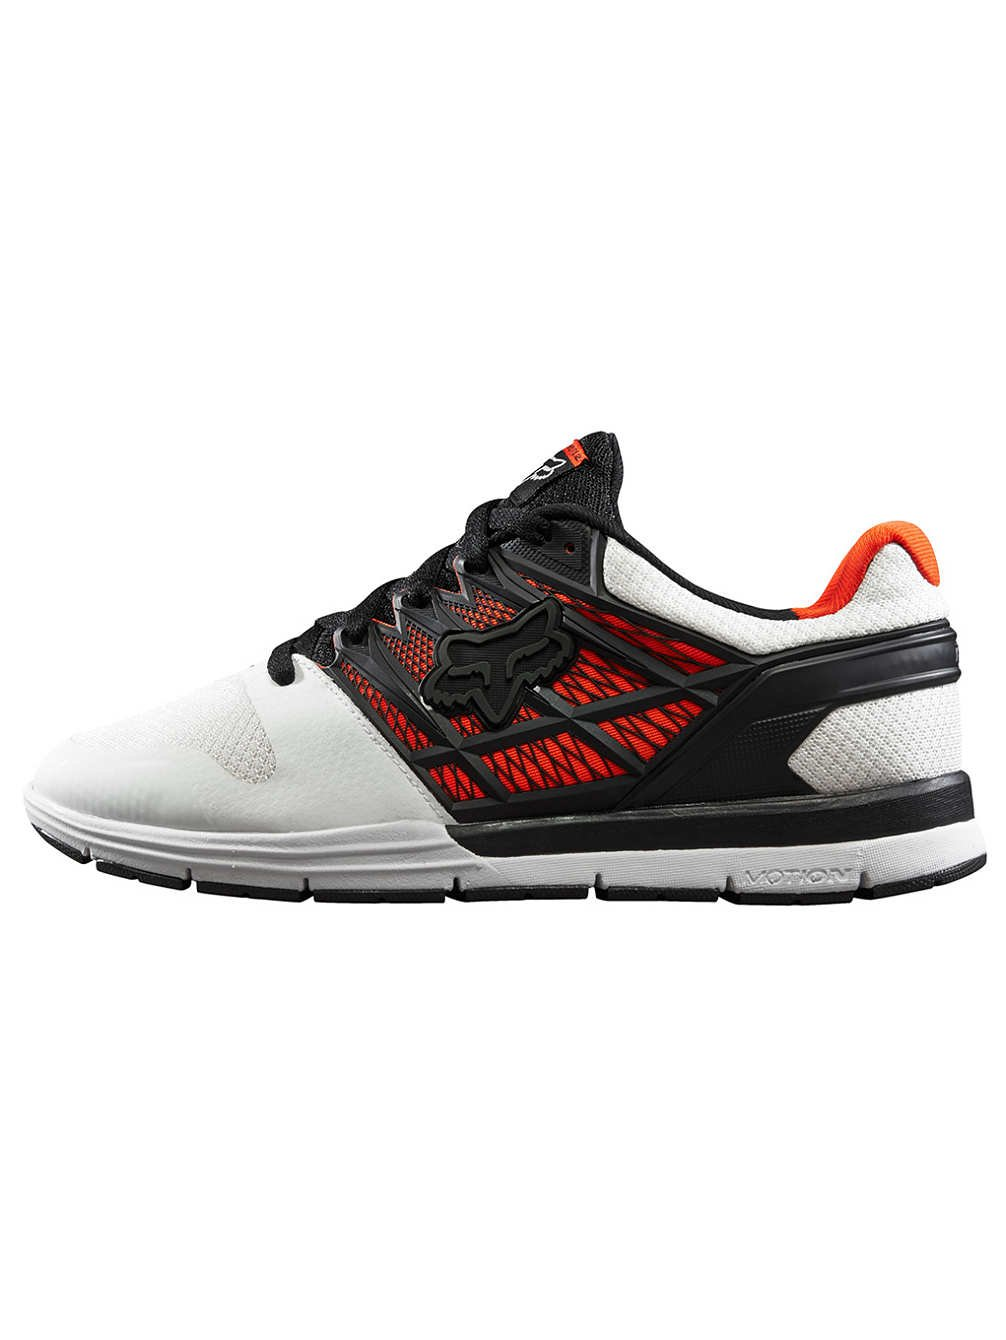 Fox Men's Motion Elite 2 Cross Training Shoe B01BHPFPP6 8.5 D(M) US|White/Red